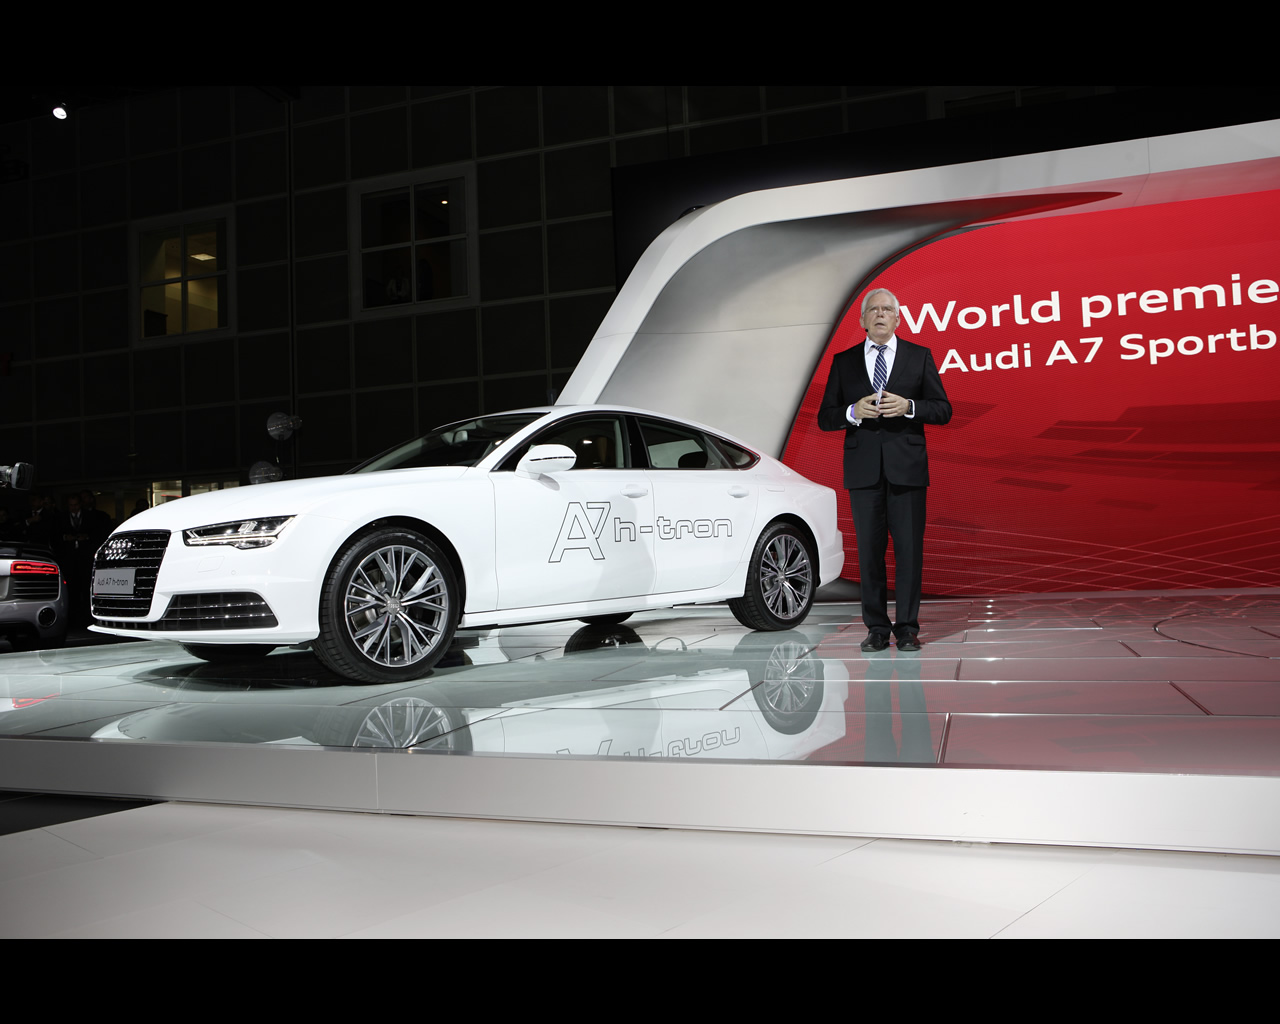 Audi A7 Sportback H-tron Quattro Hydrogen Fuel Cell